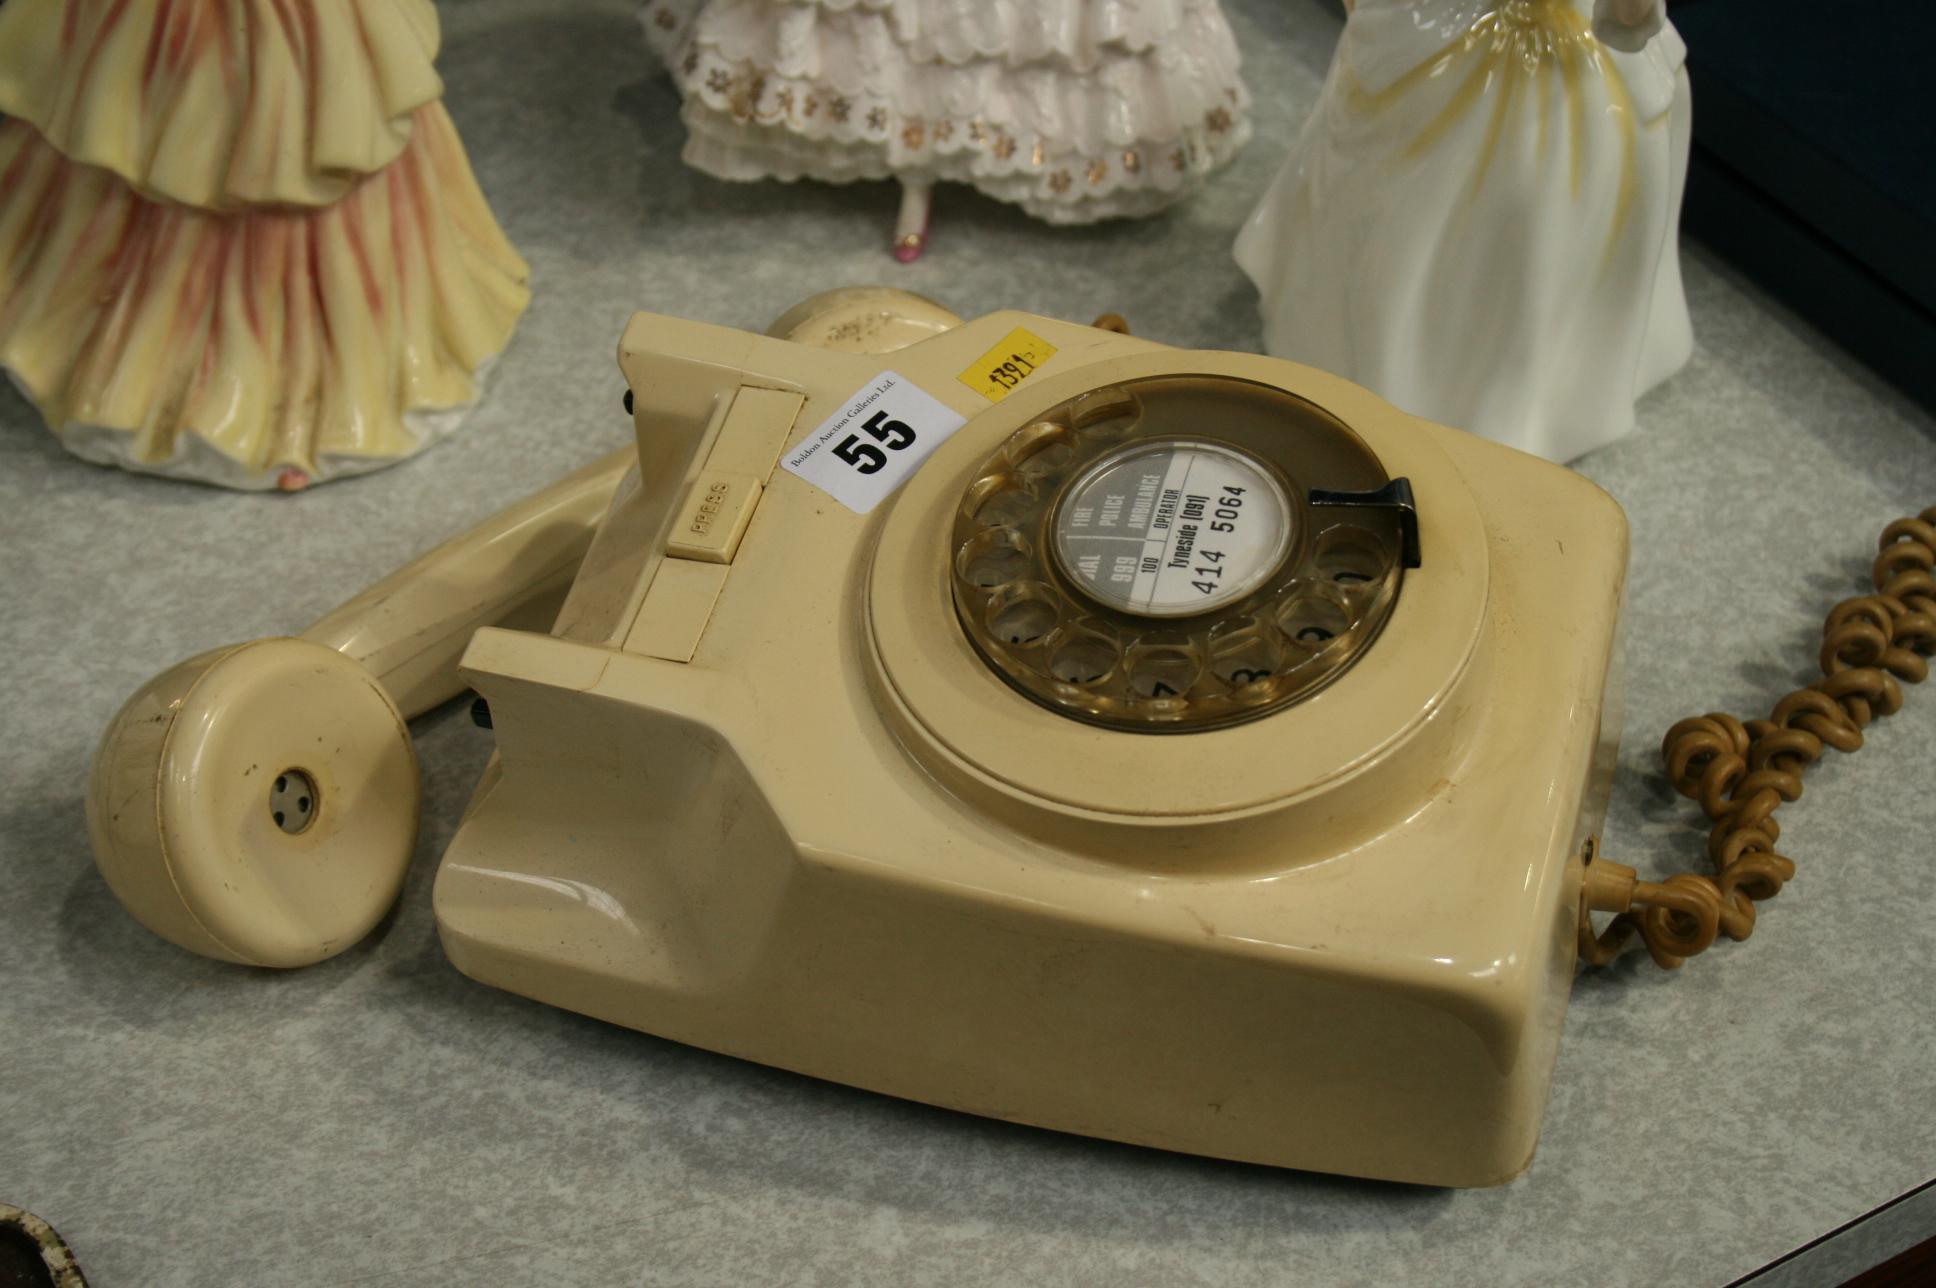 Lot 55 - Wall mounted telephone